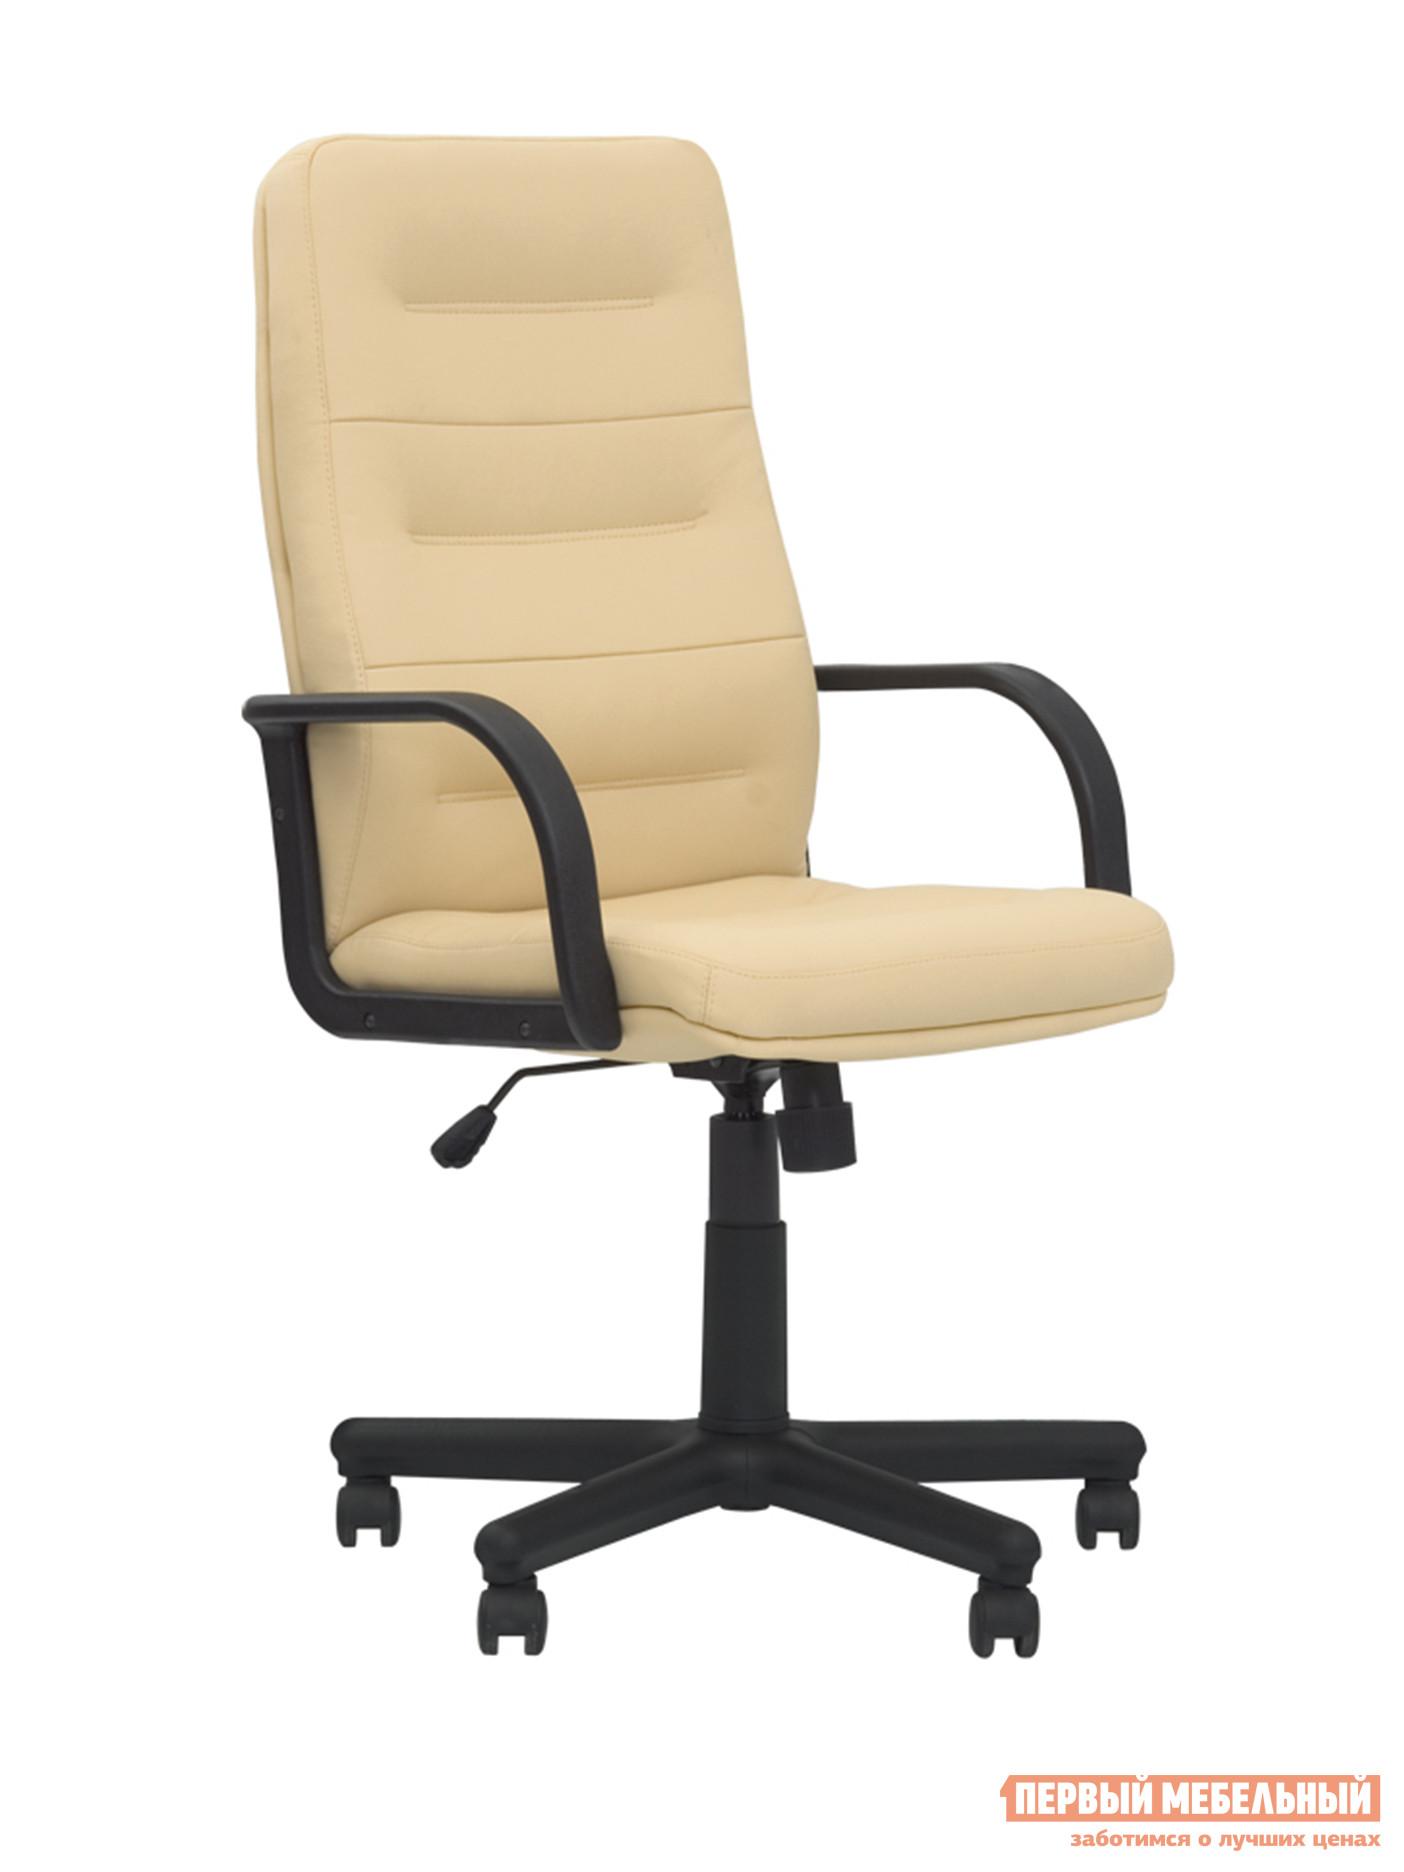 Кресло руководителя NOWYSTYL EXPERT Tilt PM64